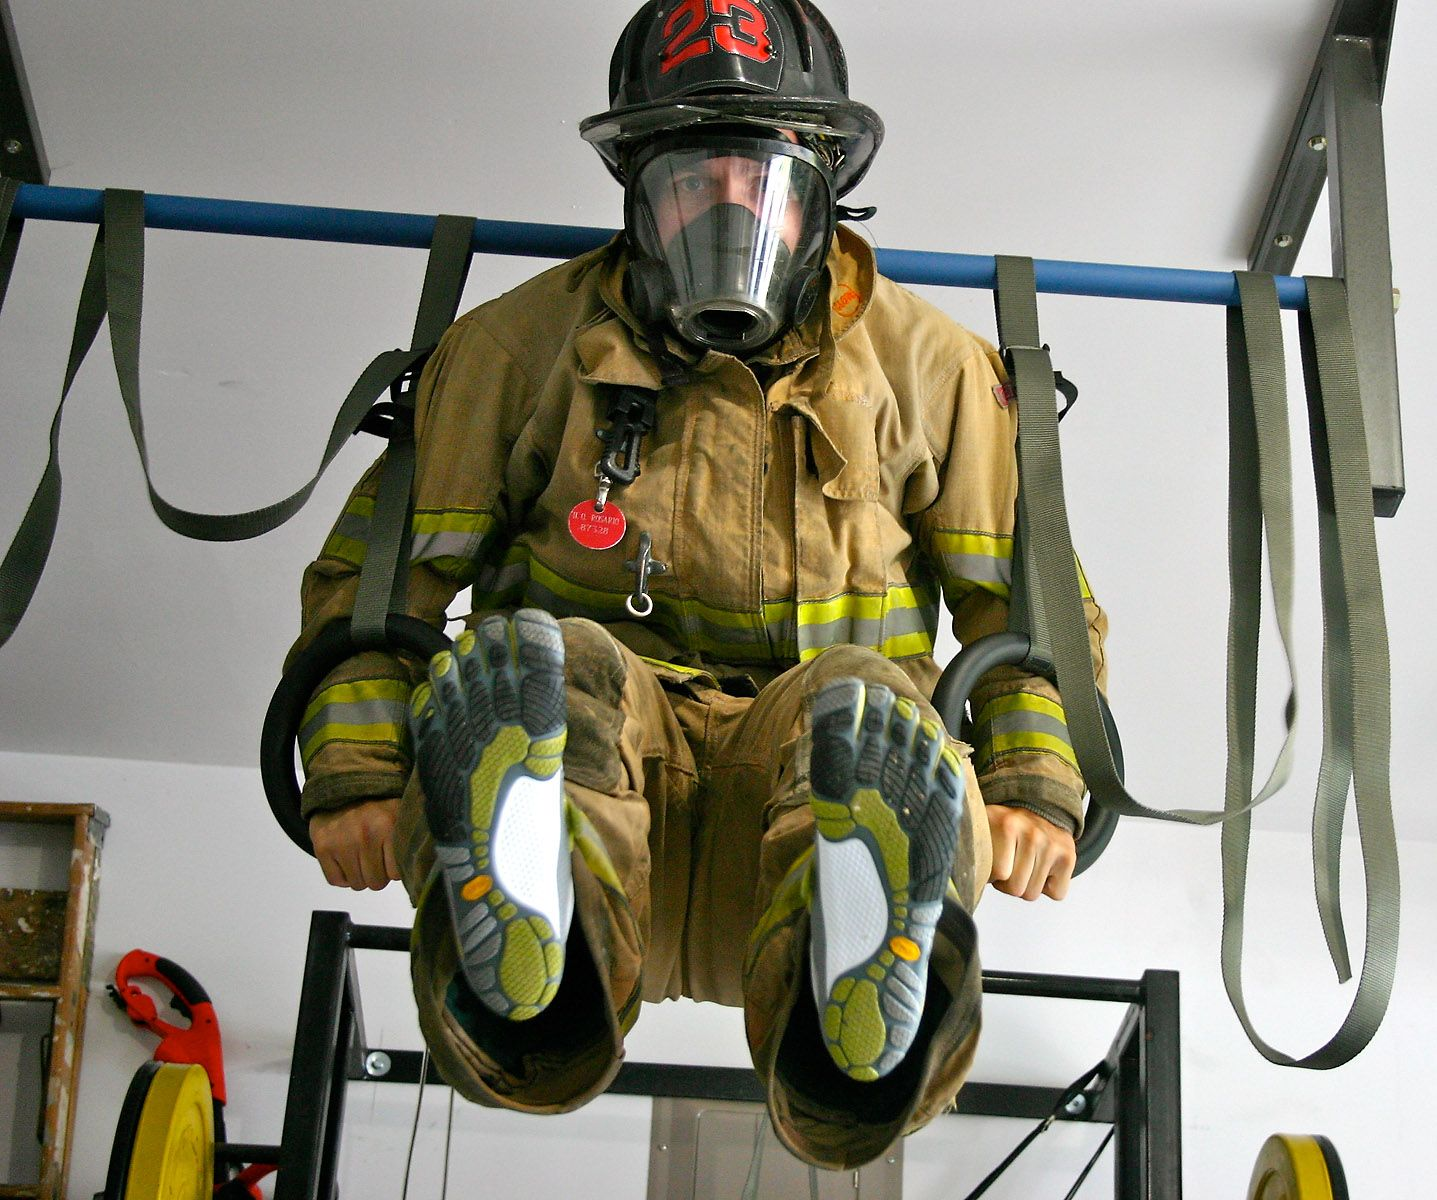 Crossfit Training In Bunker Gear Repinned By Crossed